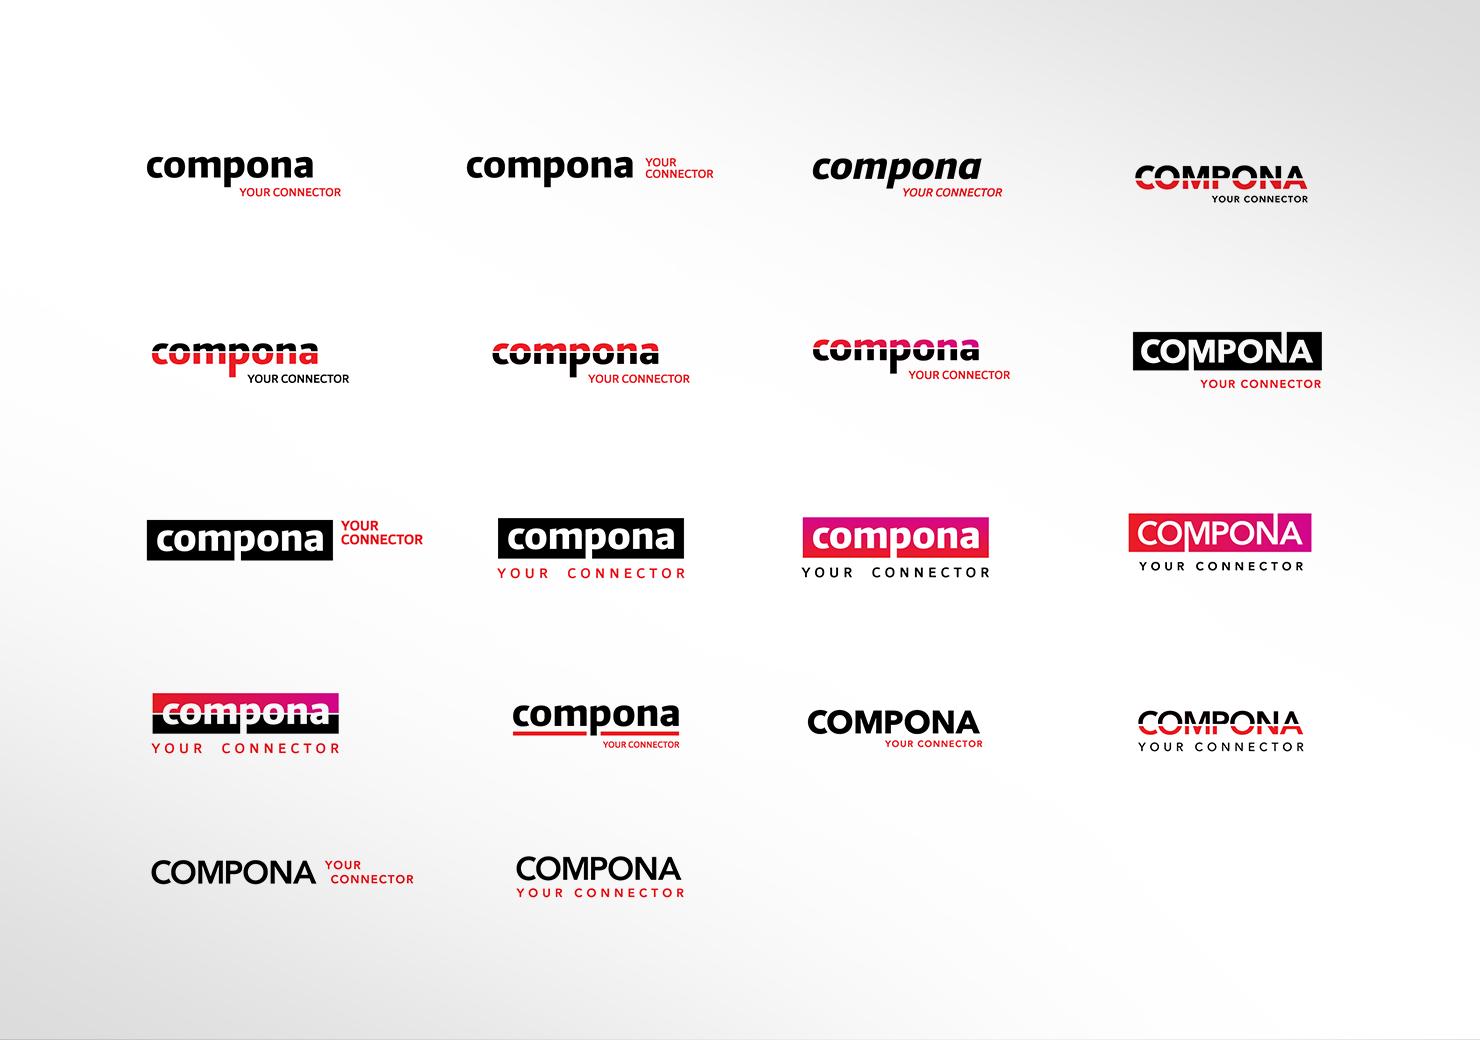 Case Compona Branding slide 4